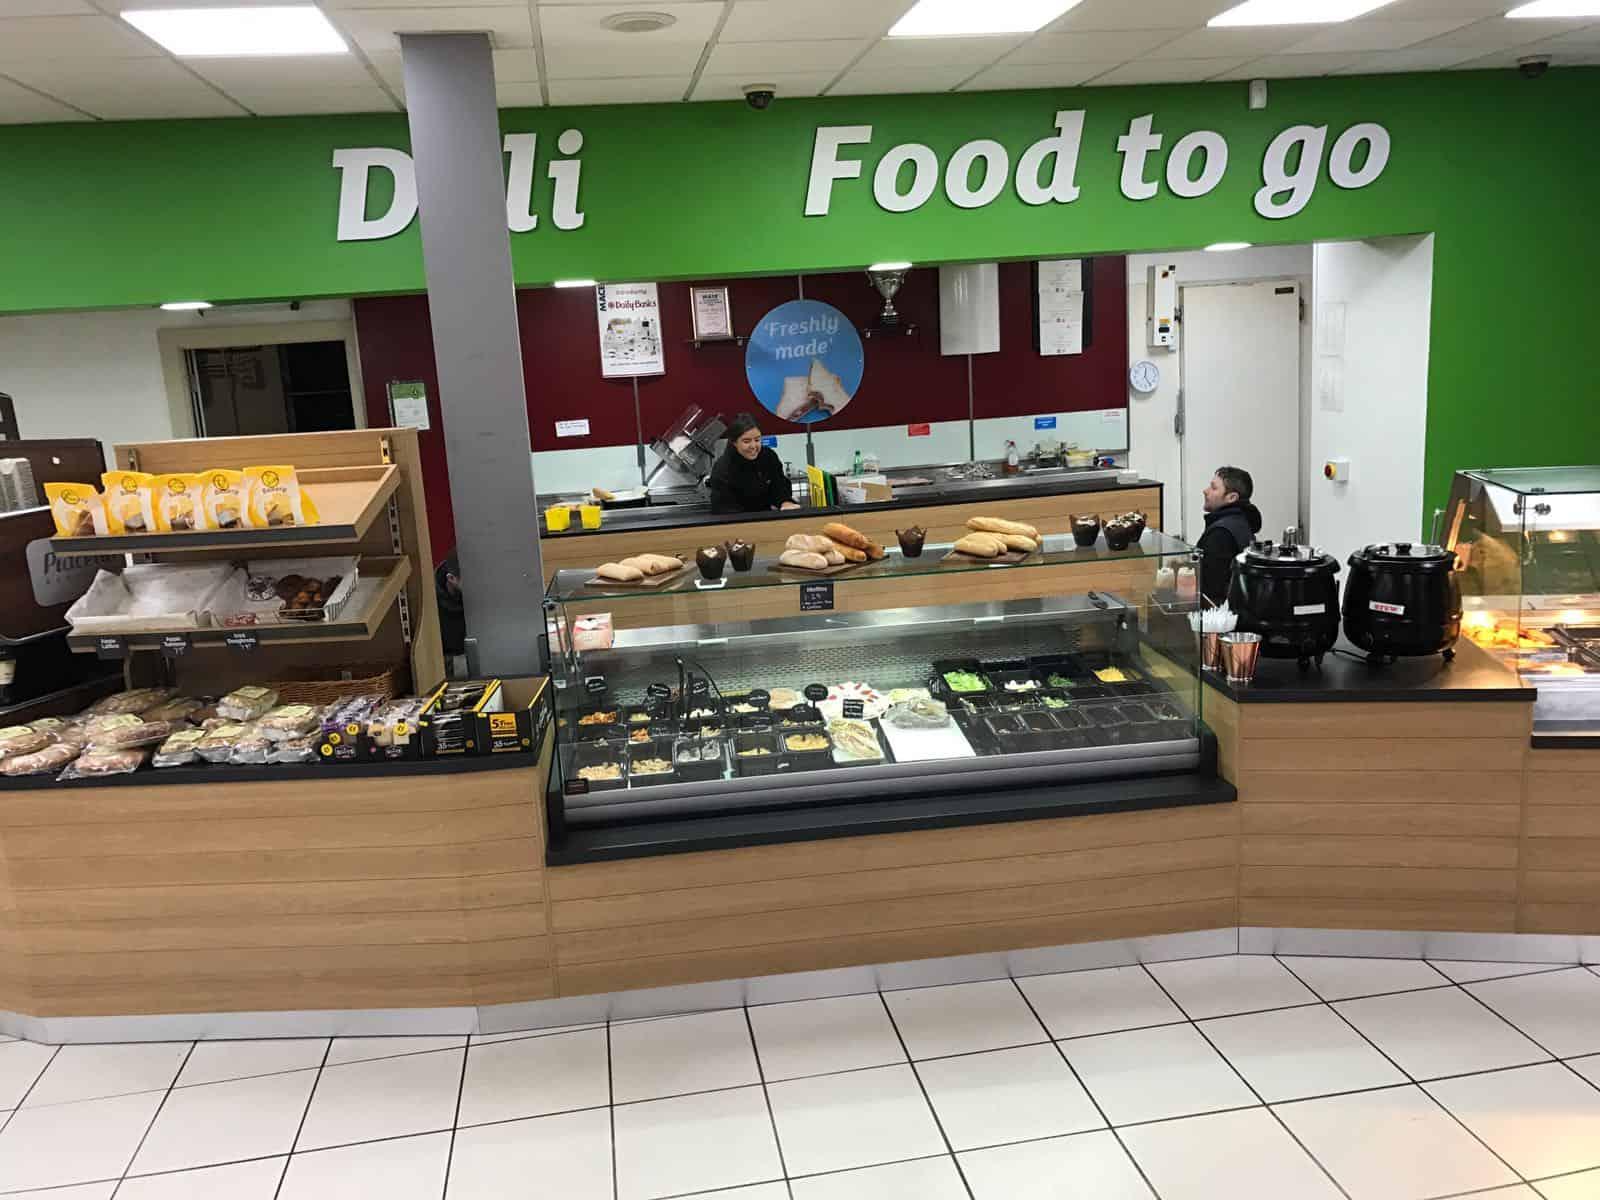 Martin Food Equipment mace-ballywalter2 Deli-Kitchen Equipment Fitout in MACE Ballywalter, Co. Down News